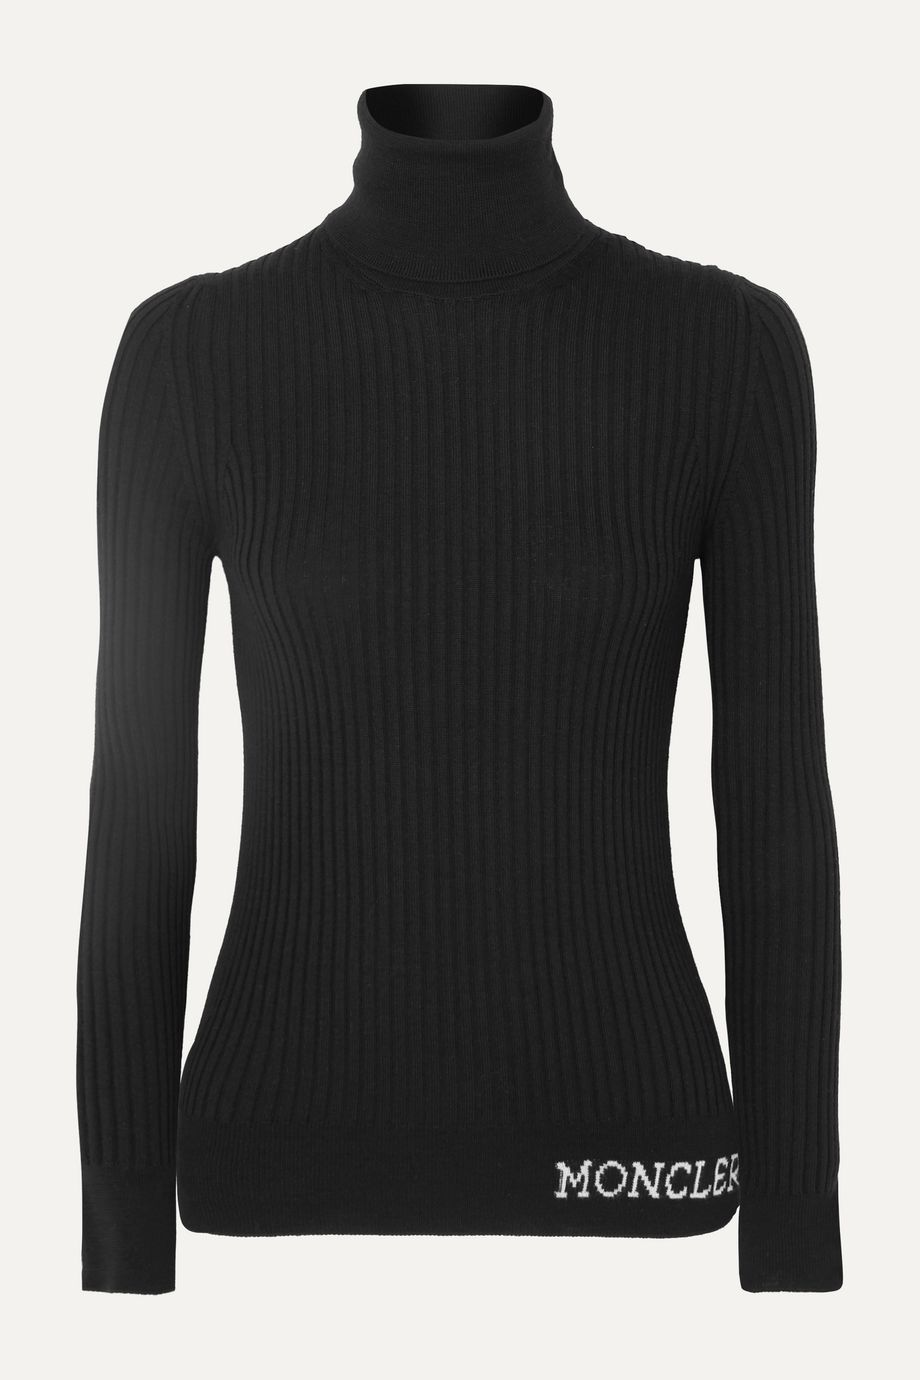 Moncler Ribbed wool turtleneck top